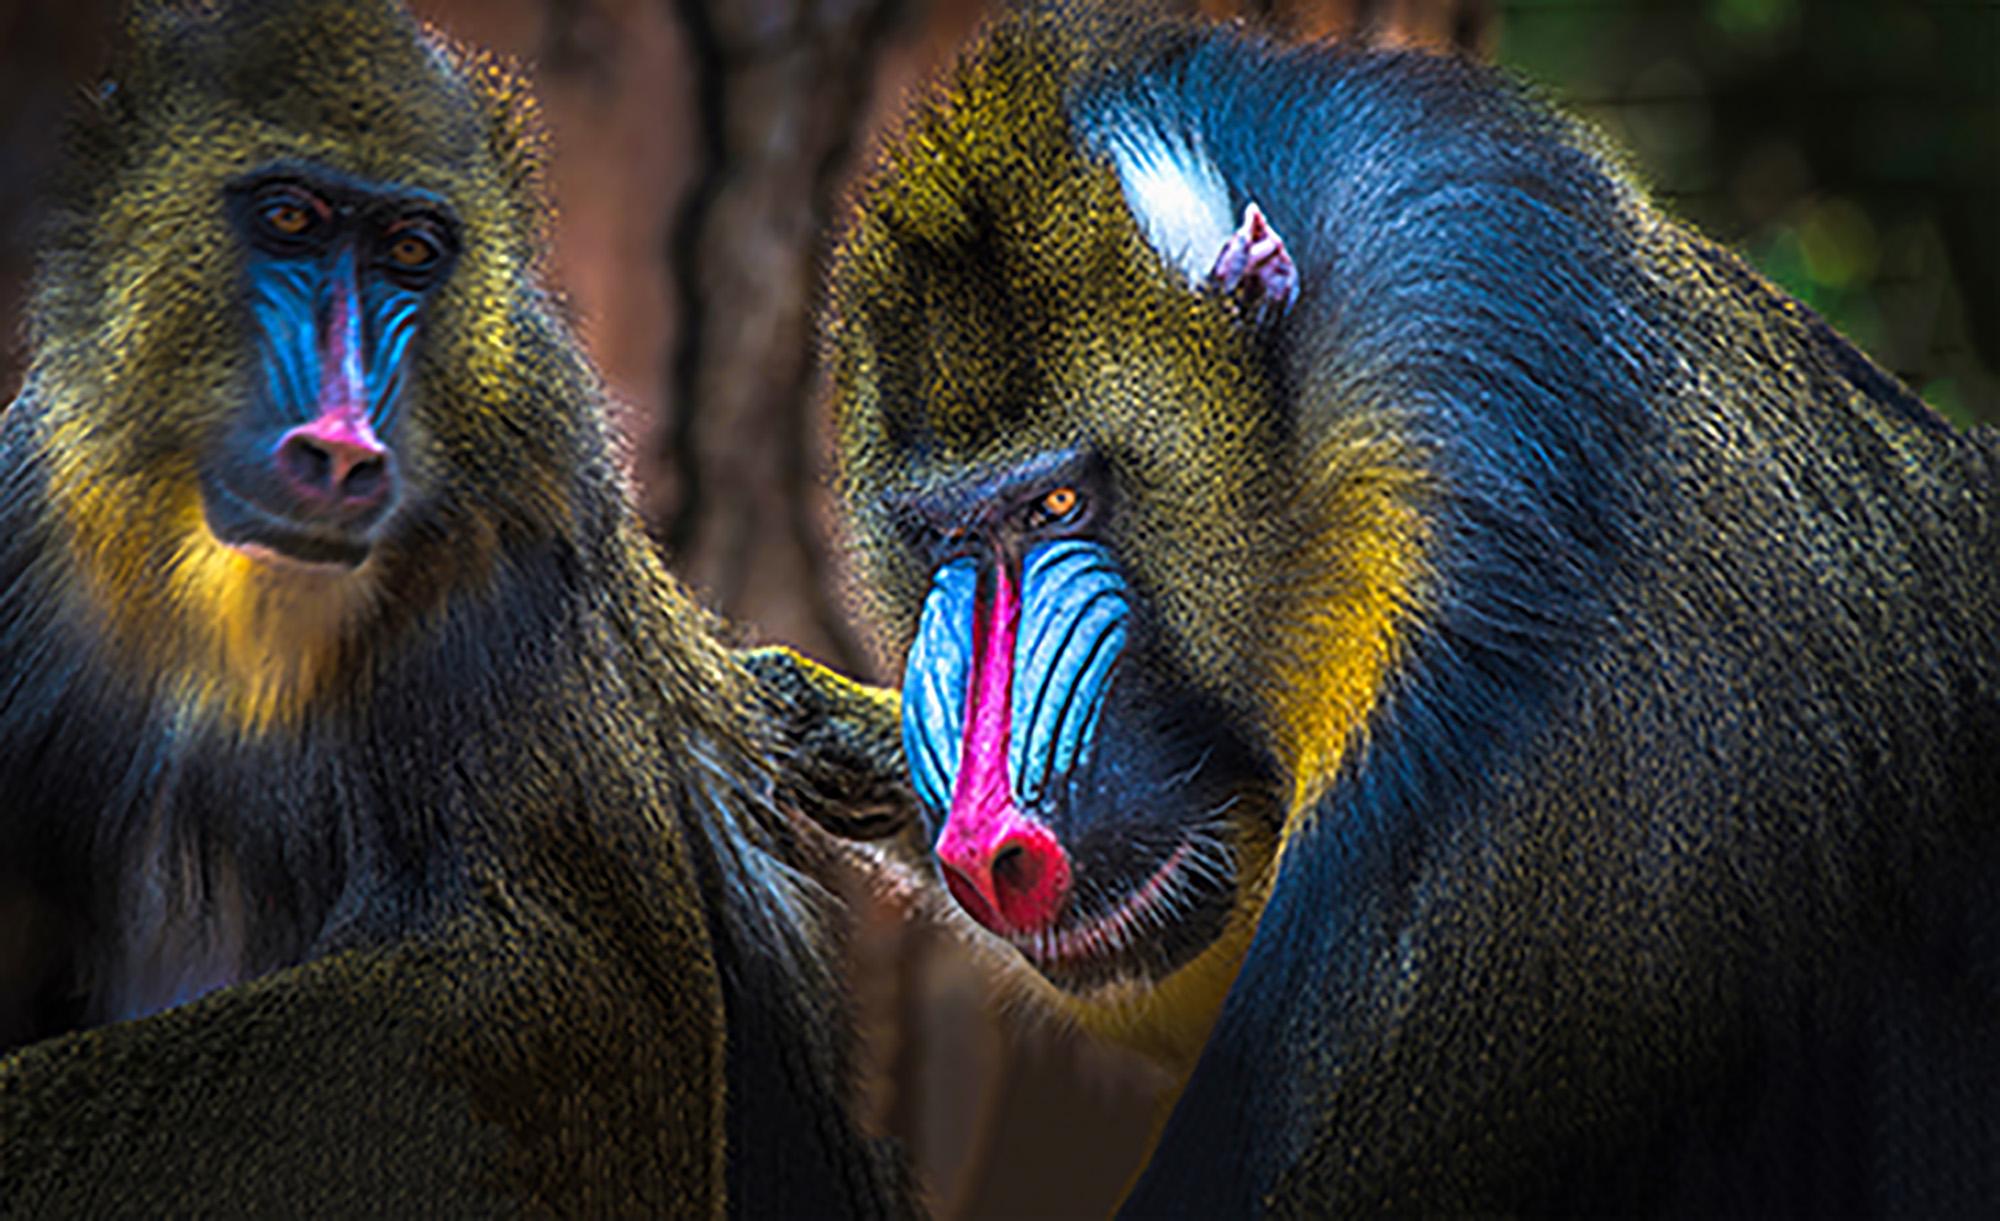 Two male mandrills